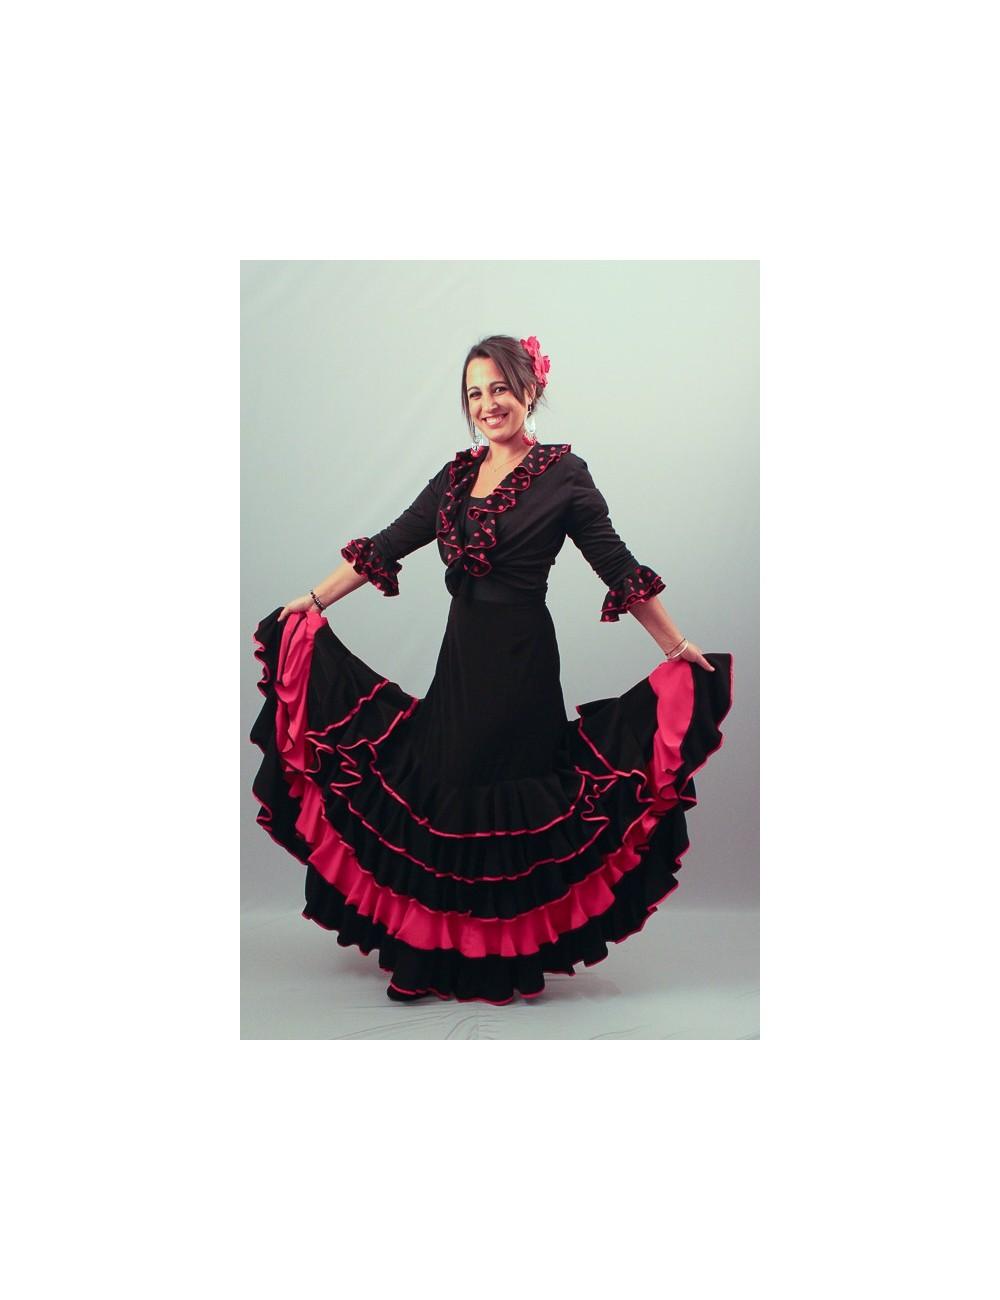 Jupe Gitane flamenco Marisma 2